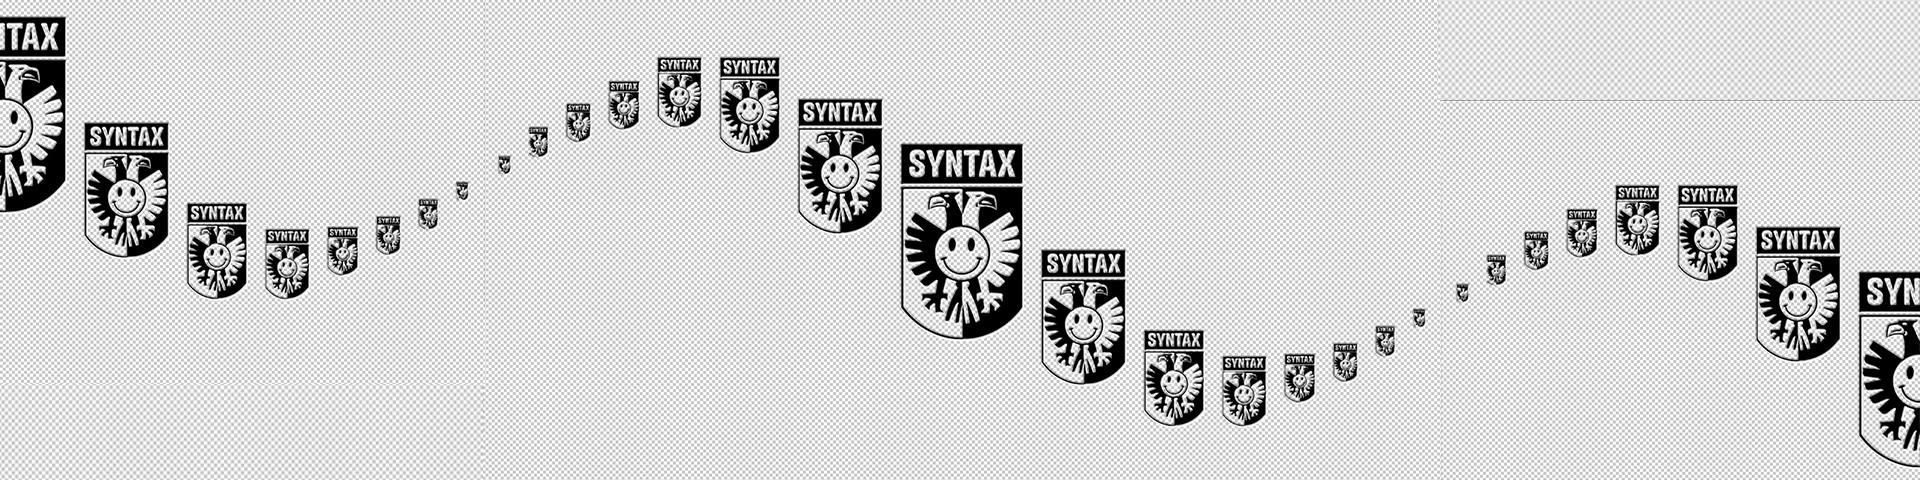 Syntax v7